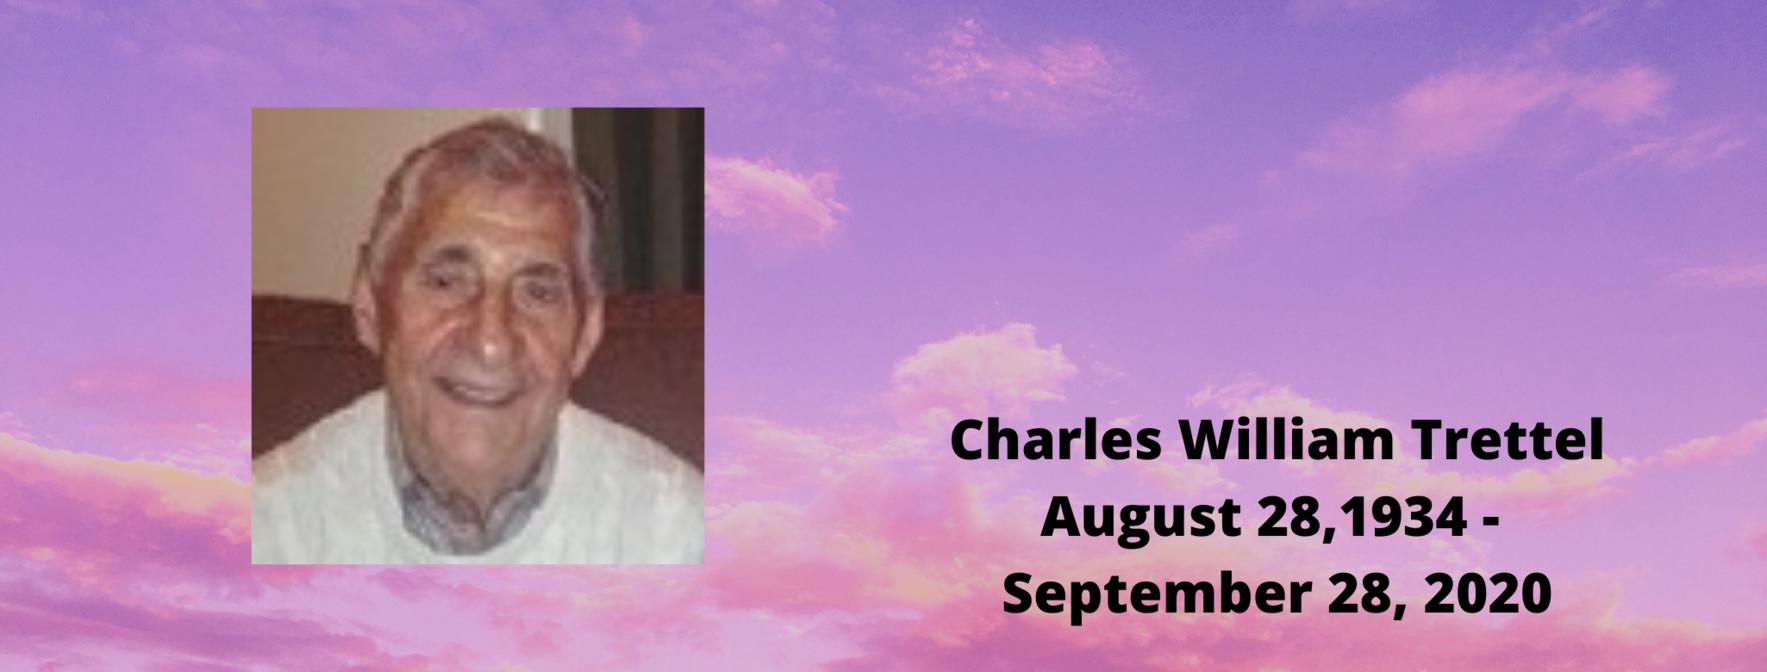 Donate in memory of Charles William Trettel image